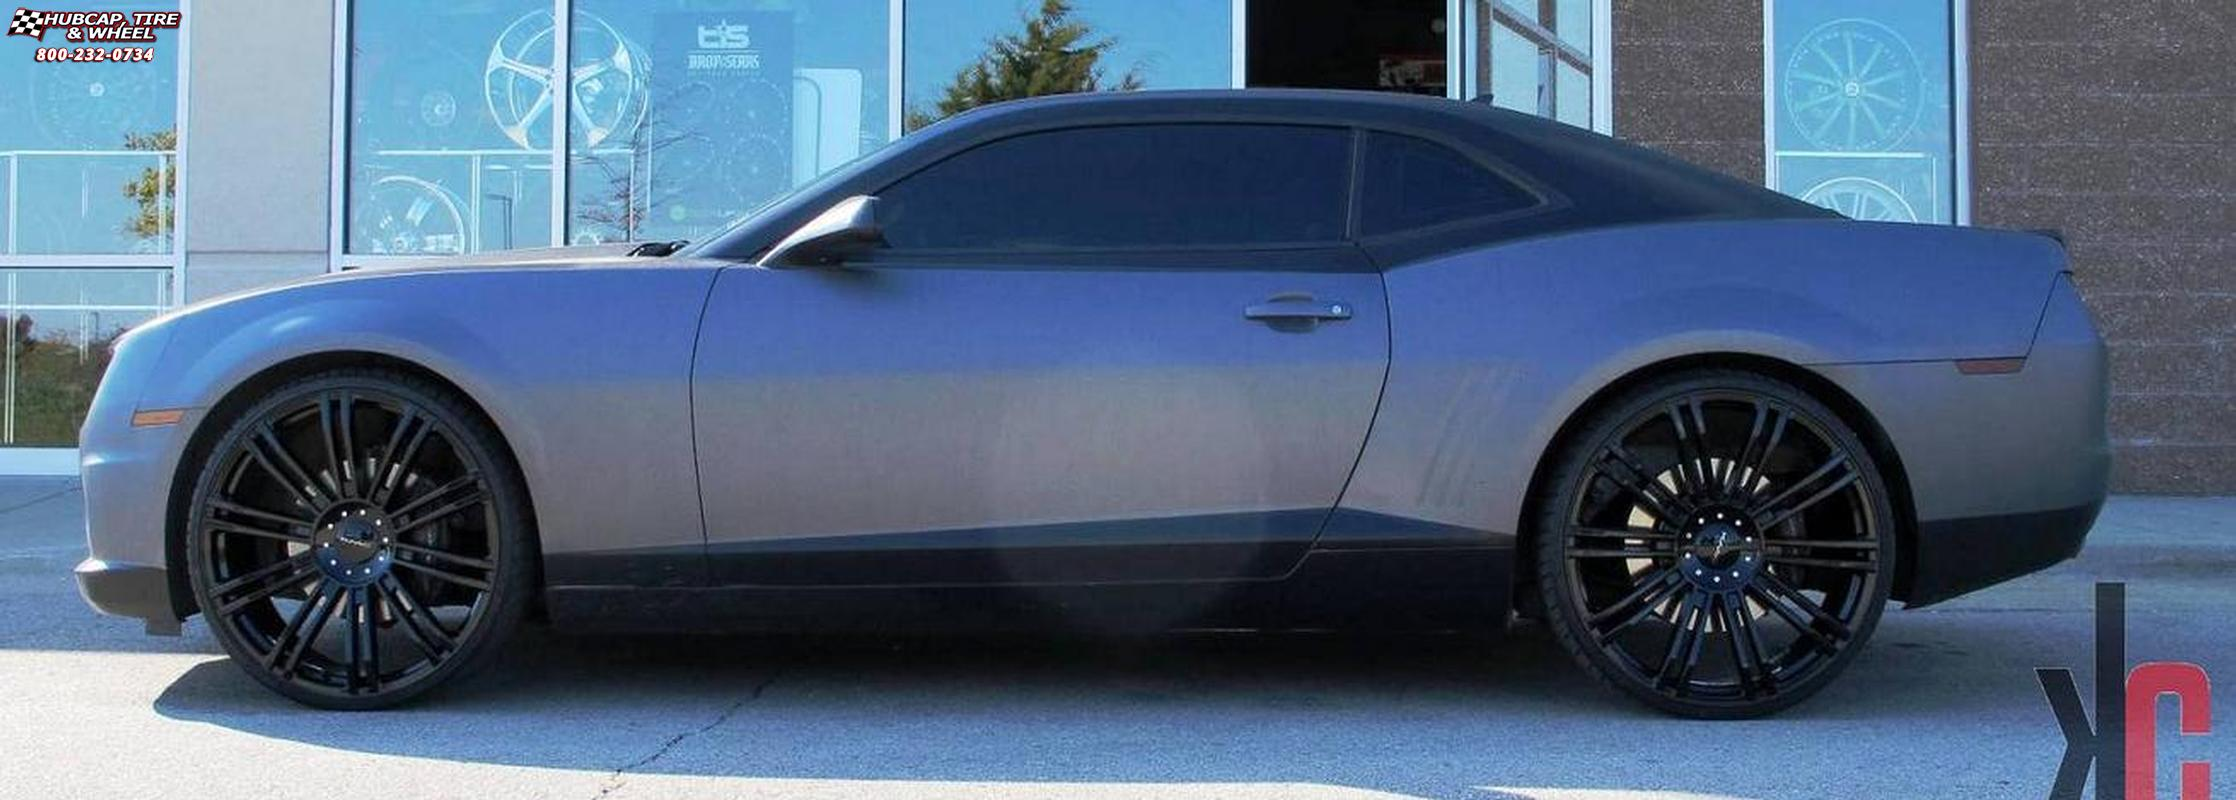 Chevy Camaro 2014 Black Rims